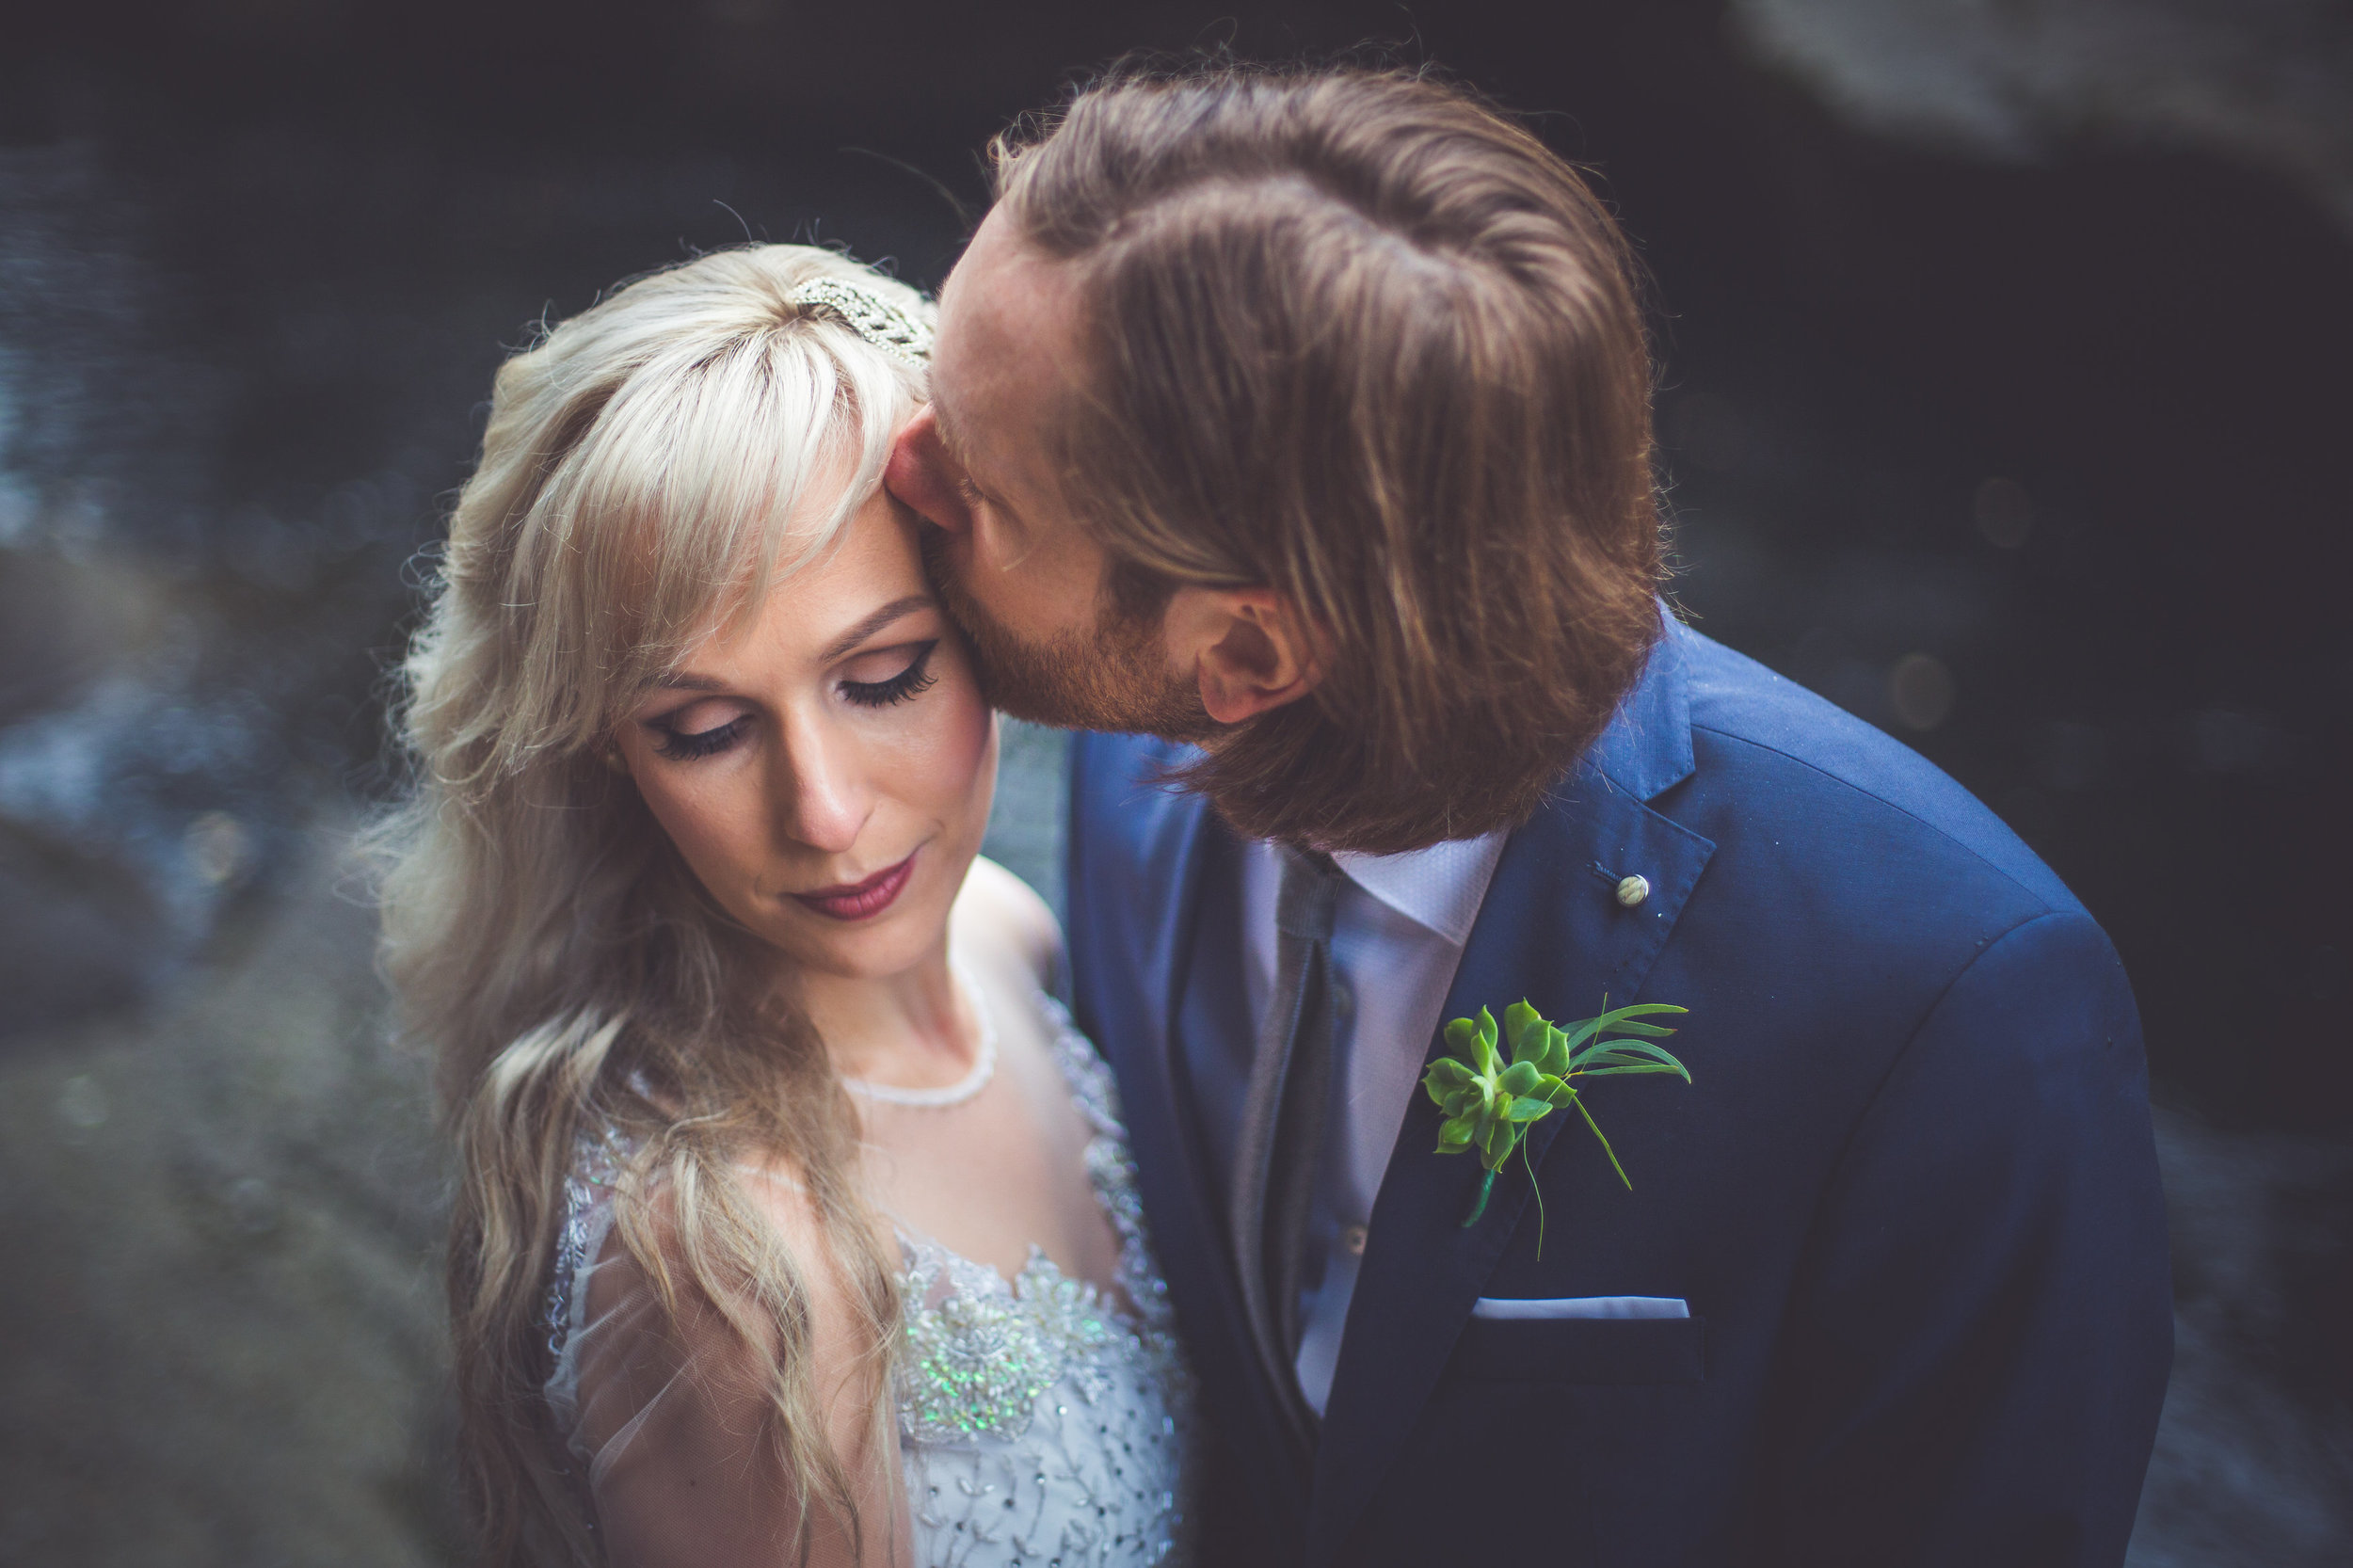 whimsical-romantic-wedding-top-bridge-7.jpg